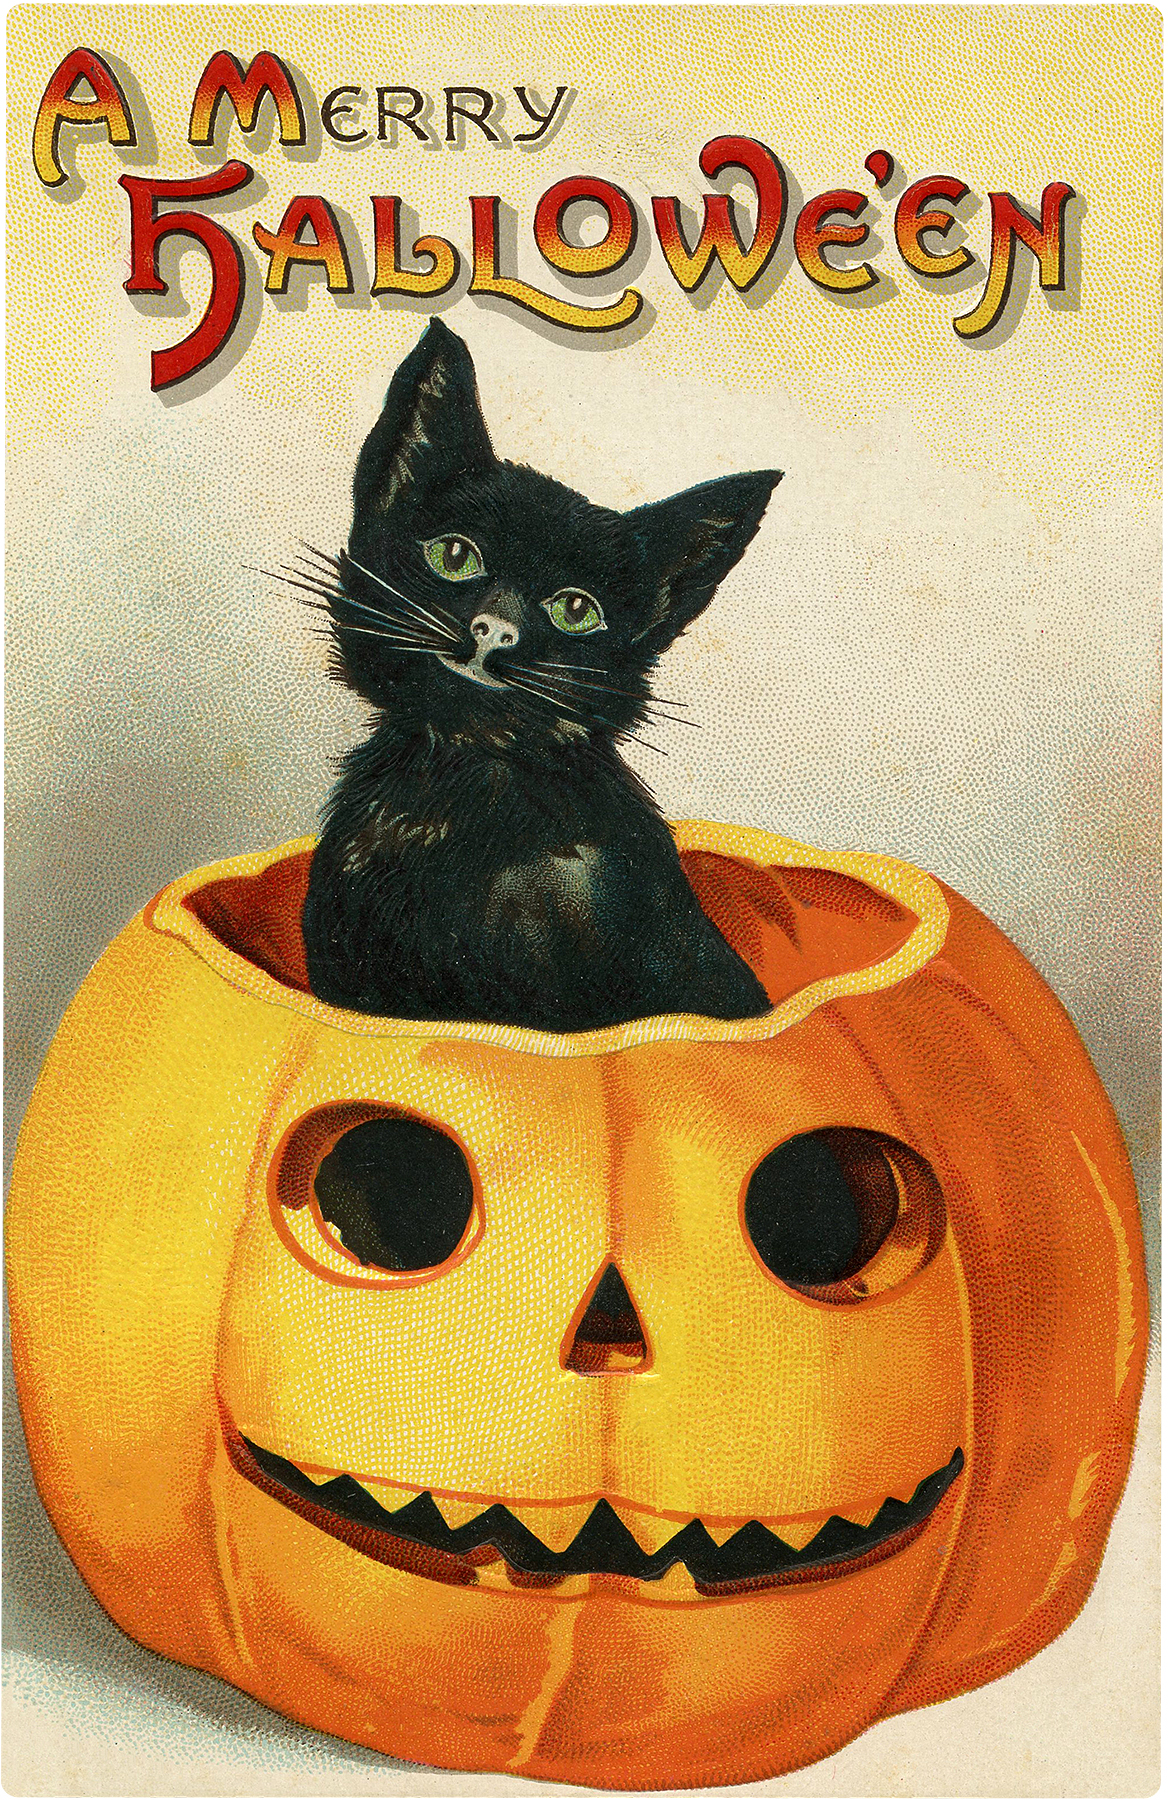 Retro Cute Black Cat In Pumpkin Halloween Graphic!